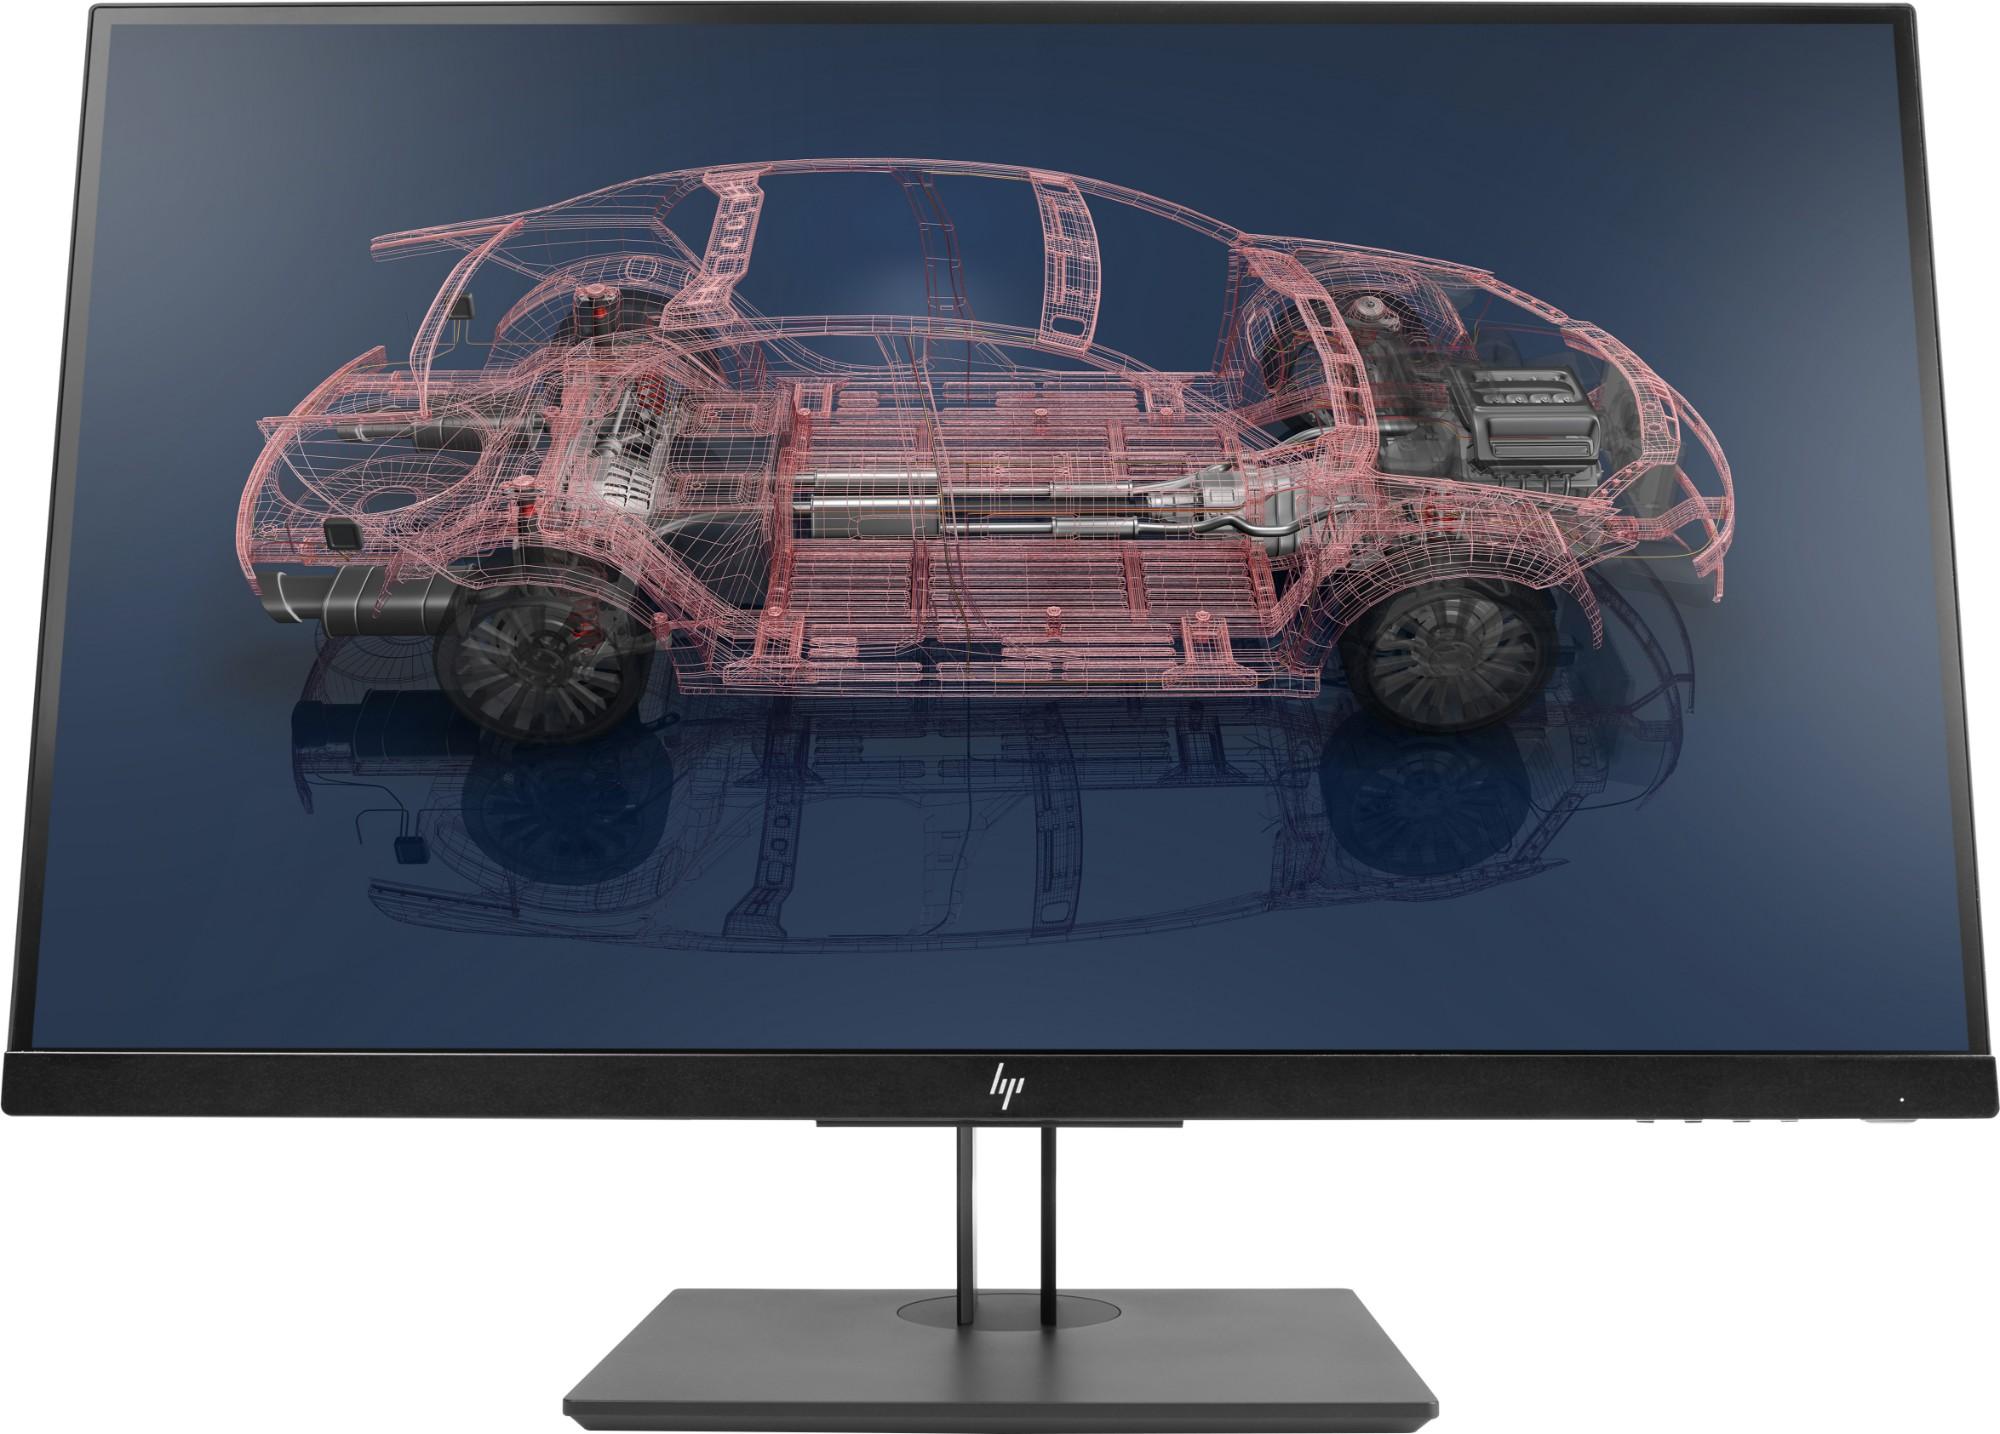 "HP Z27n G2 LED display 68.6 cm (27"") 2560 x 1440 pixels Quad HD Flat Silver"